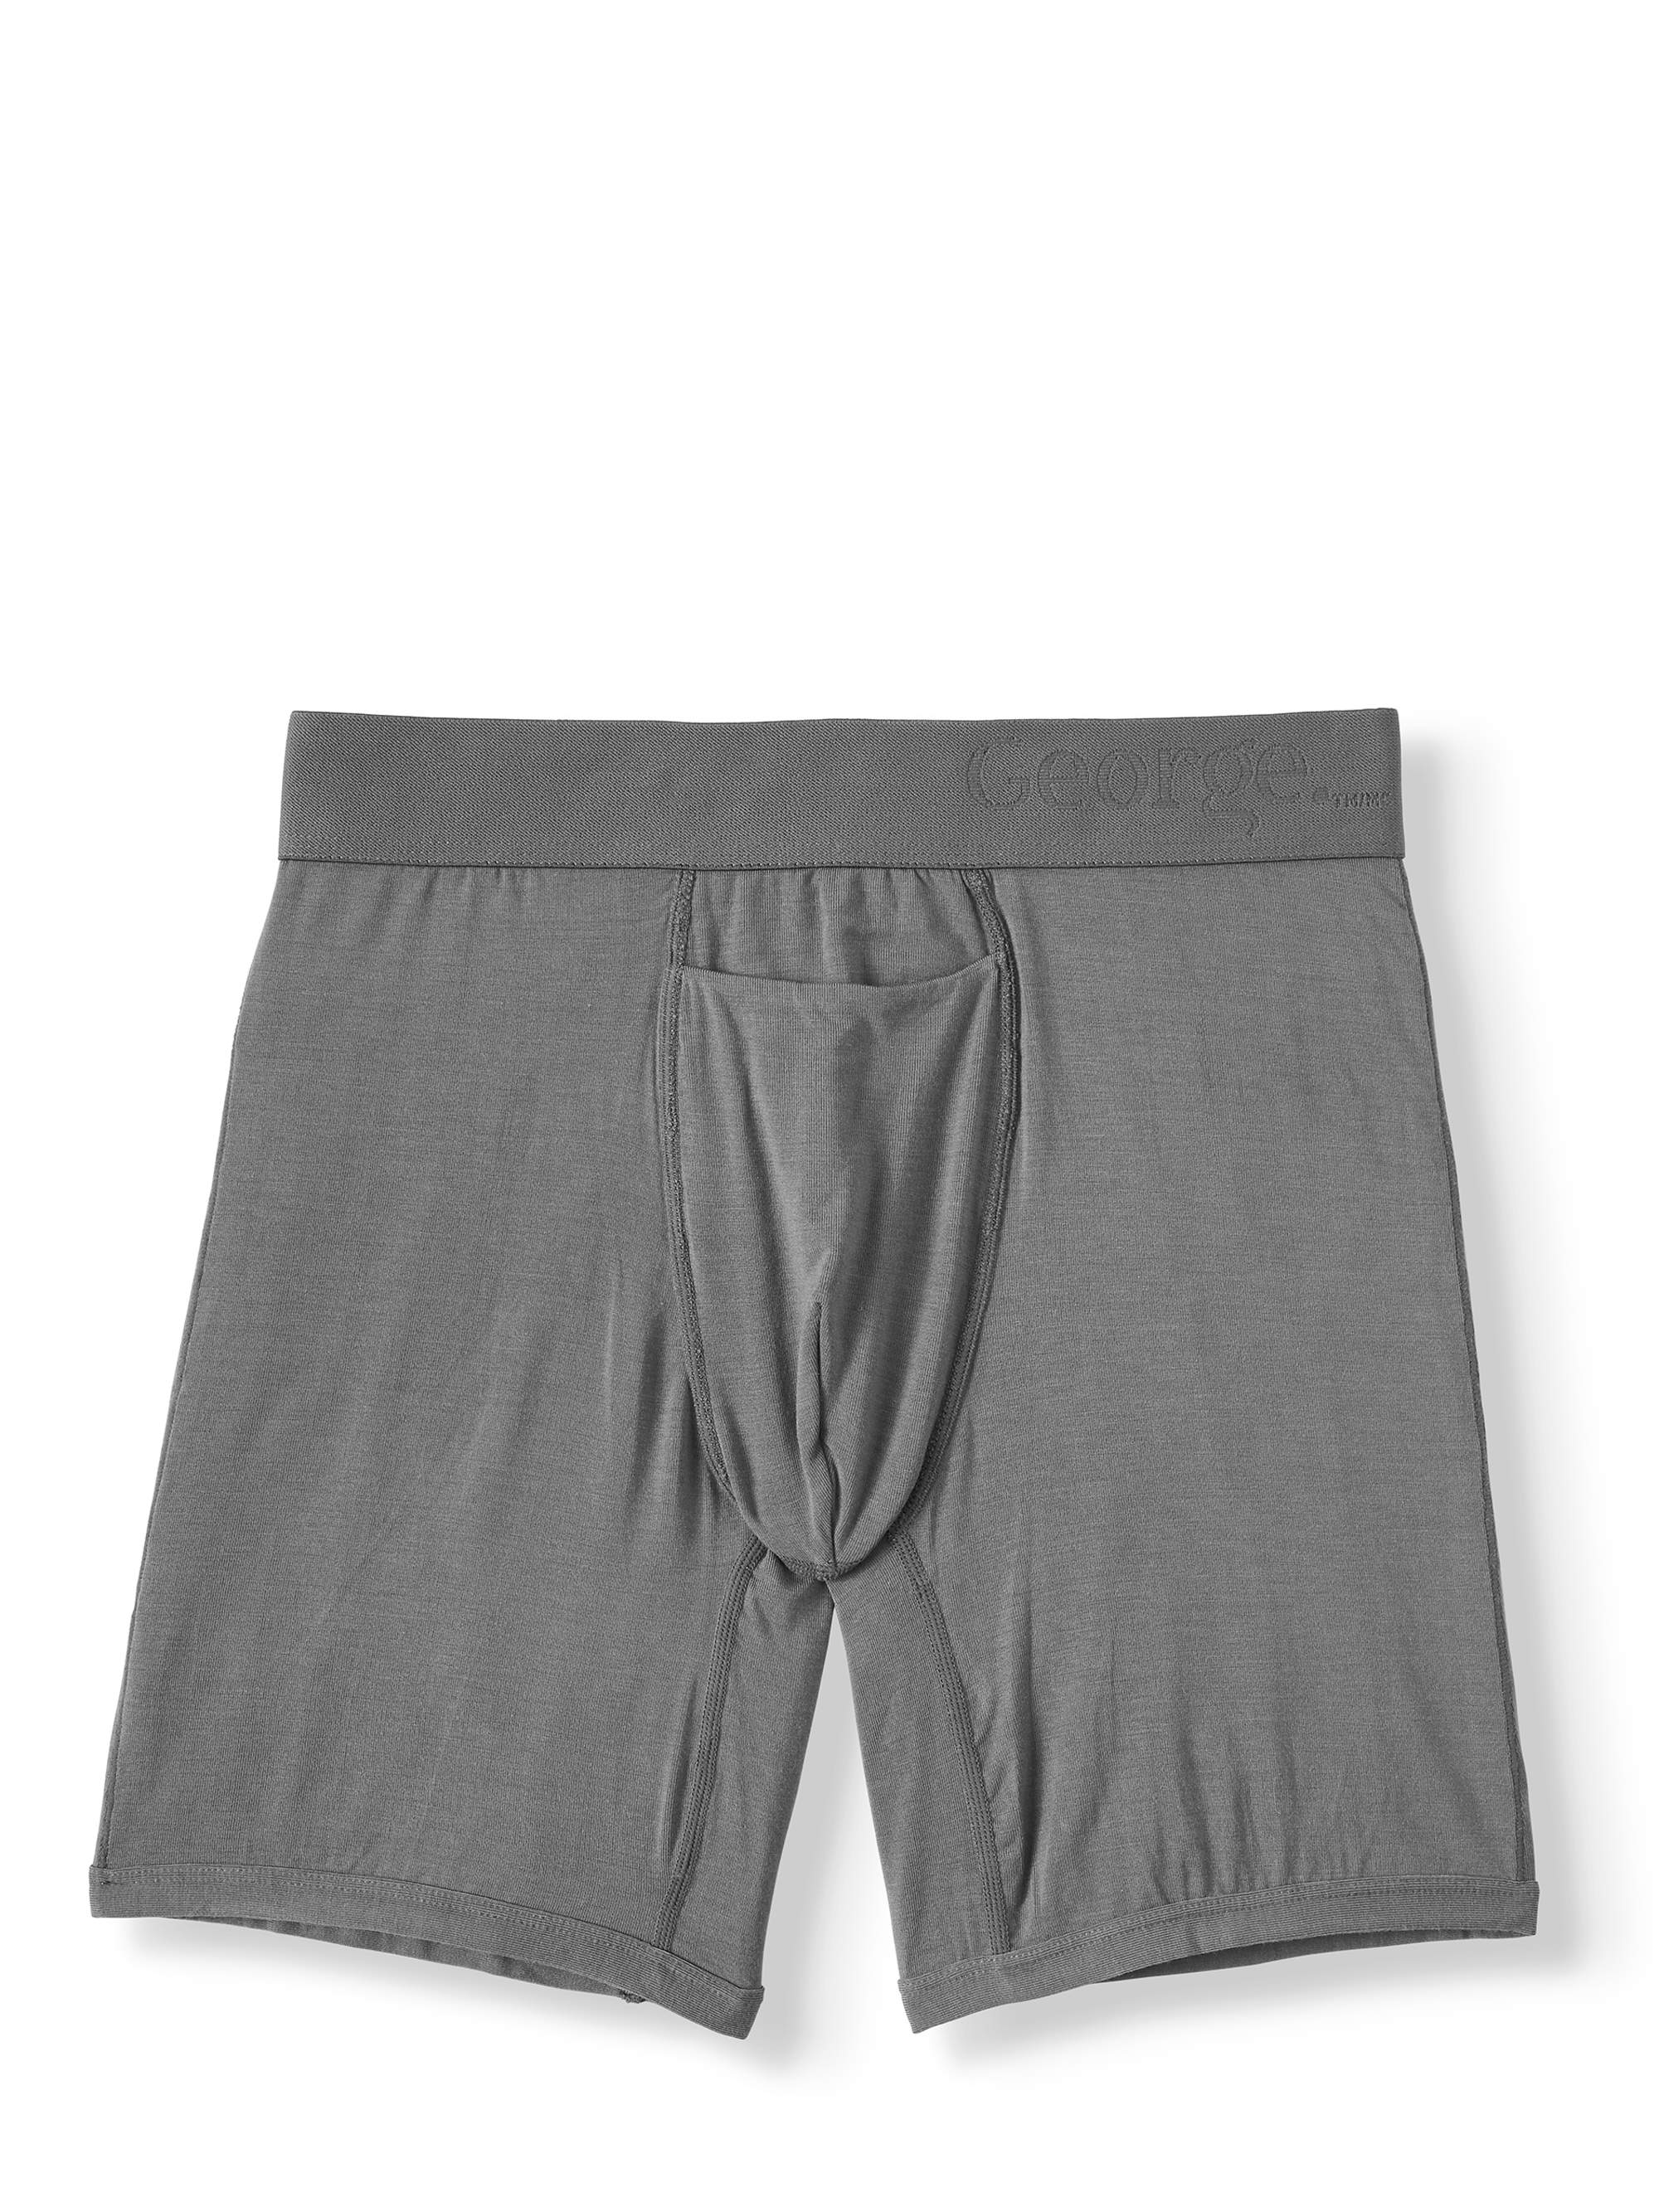 Mens Underpants Boxer Briefs Love Always Wins Underwear Low Waist Cotton No Trace